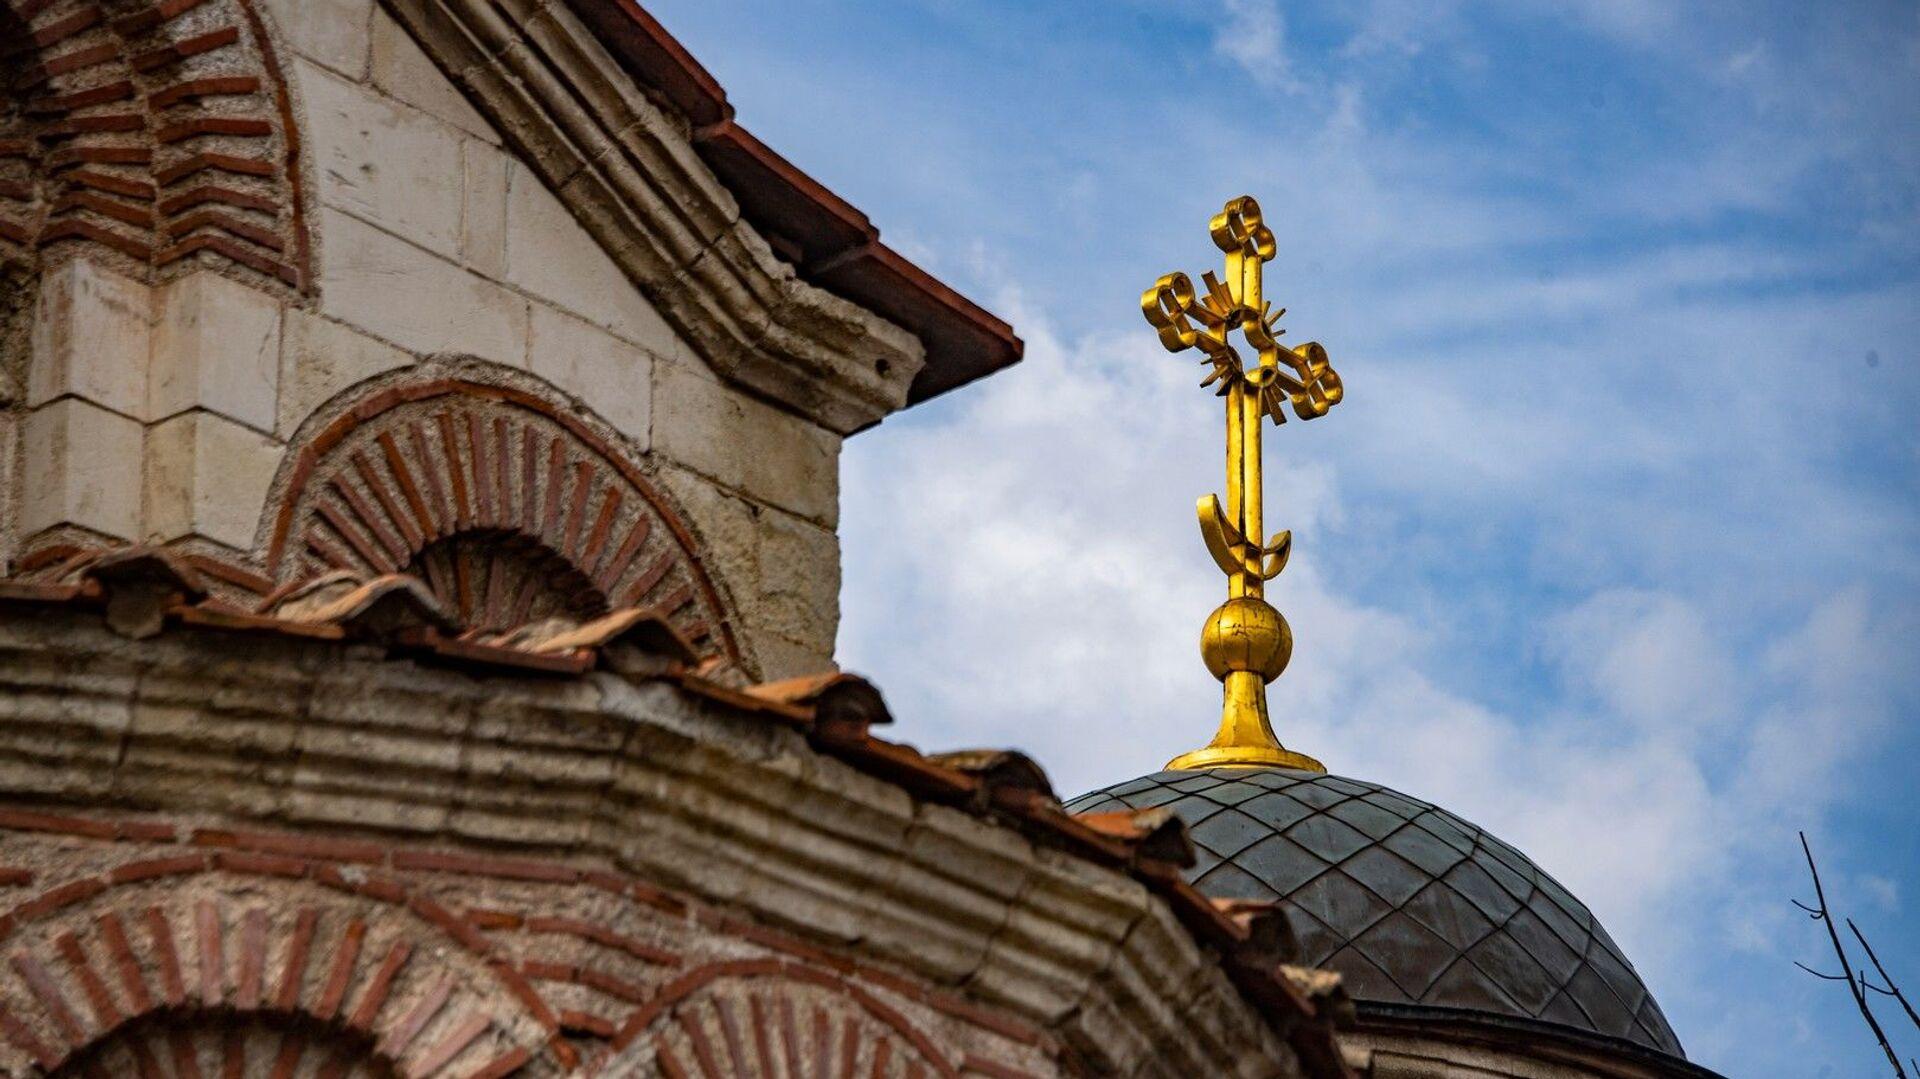 Храм Святого Иоанна Предтечи в Керчи - РИА Новости, 1920, 25.09.2021